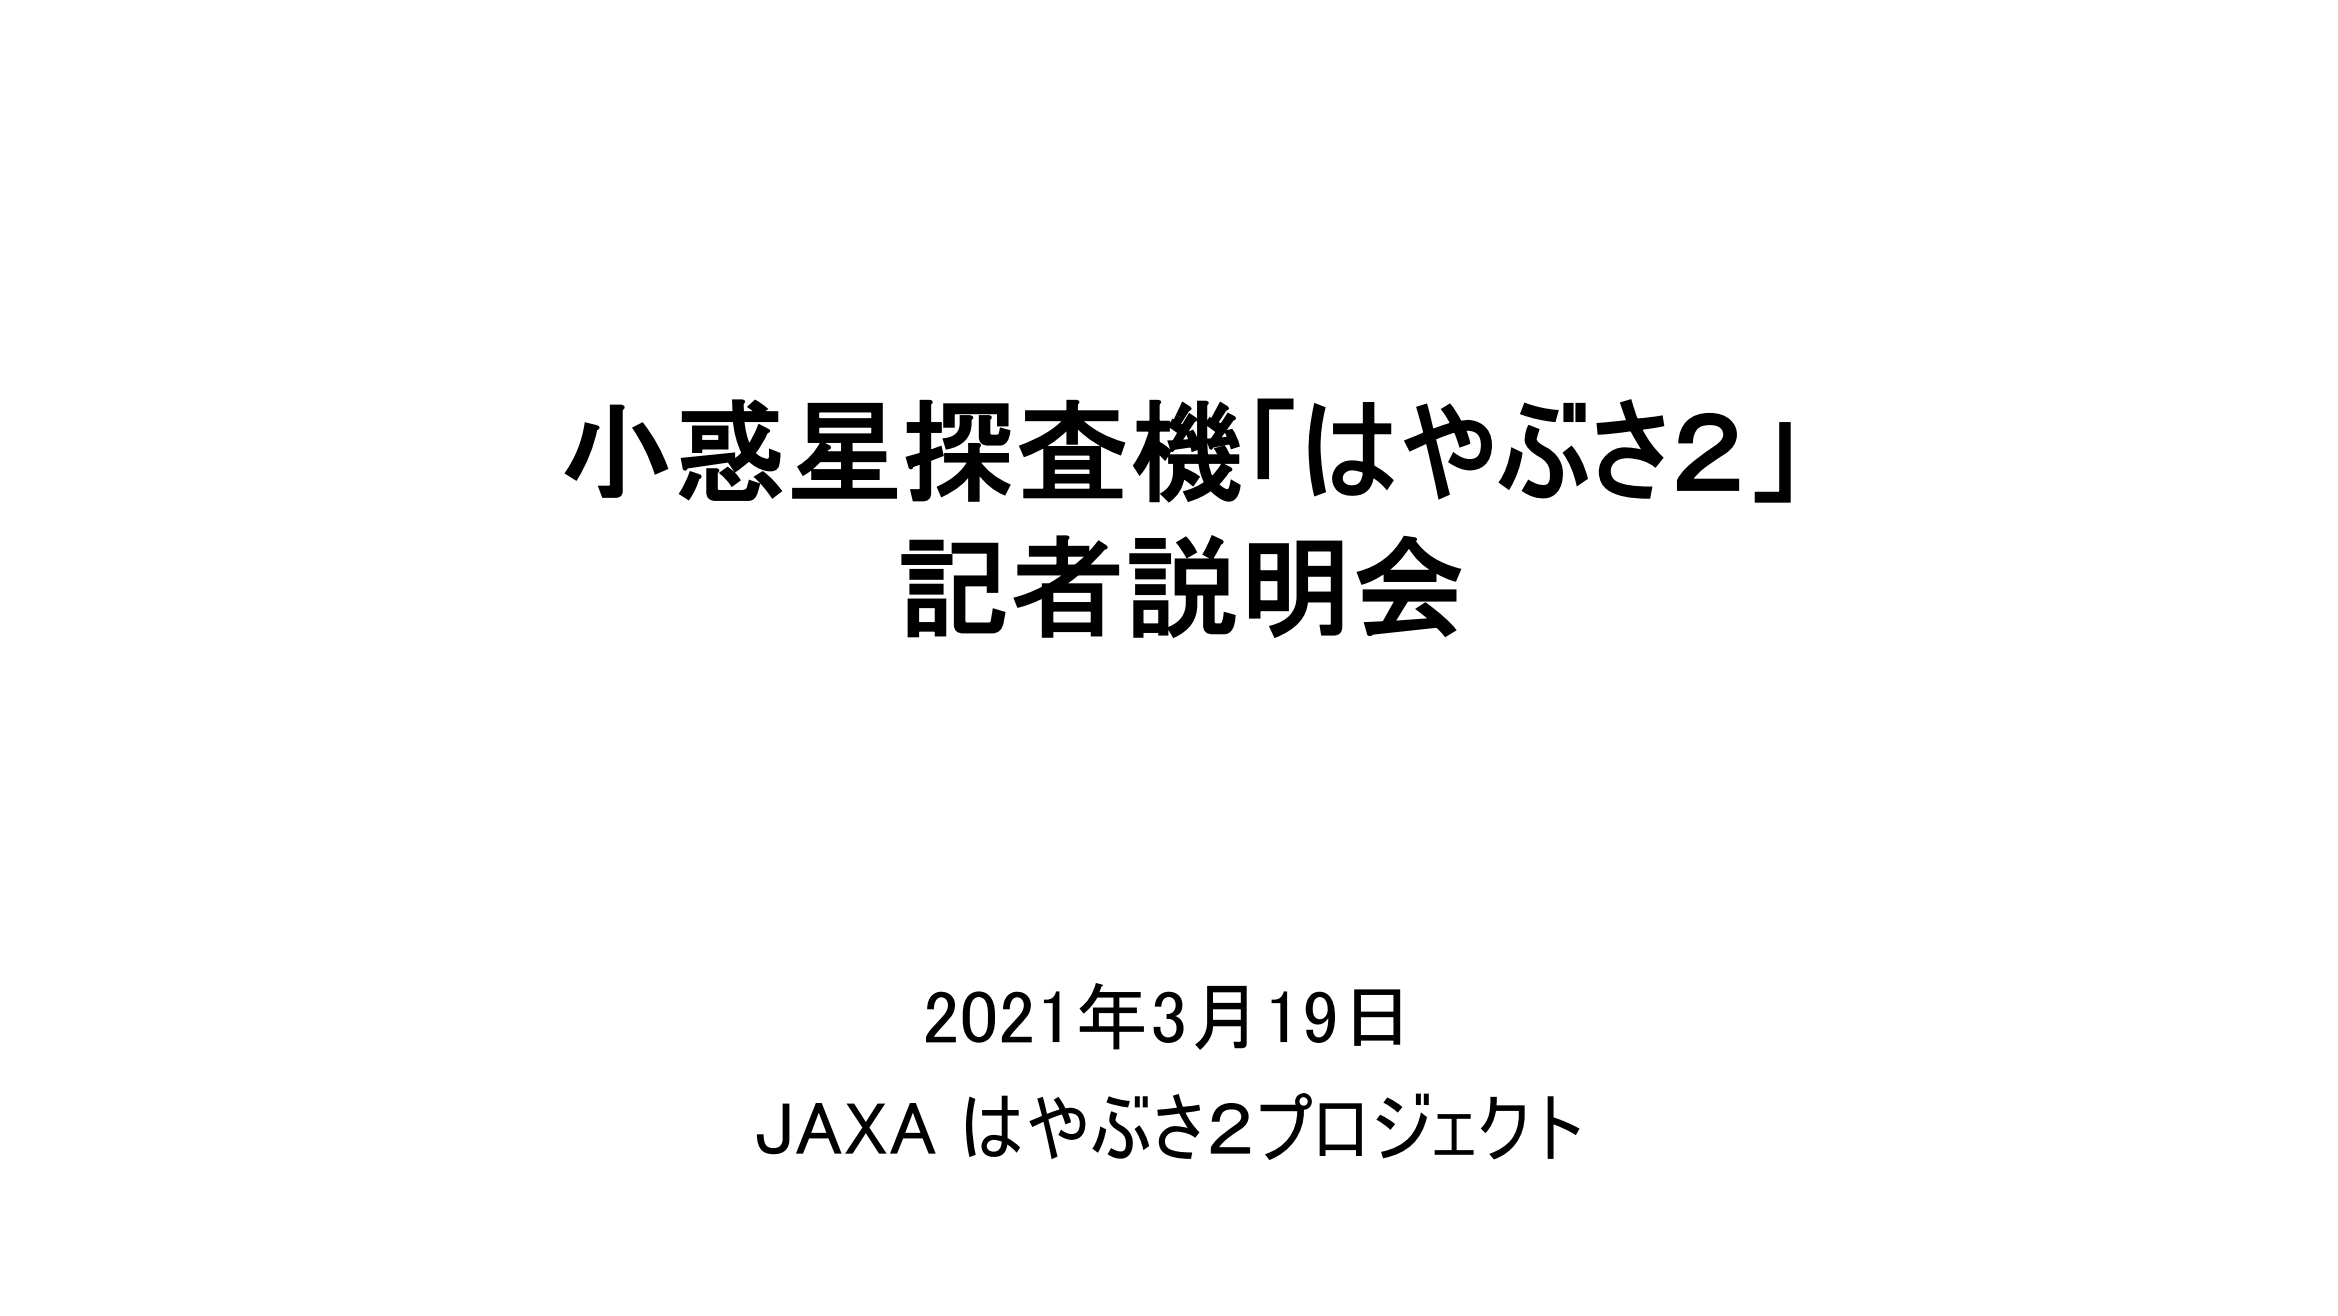 f:id:Imamura:20210319144350p:image